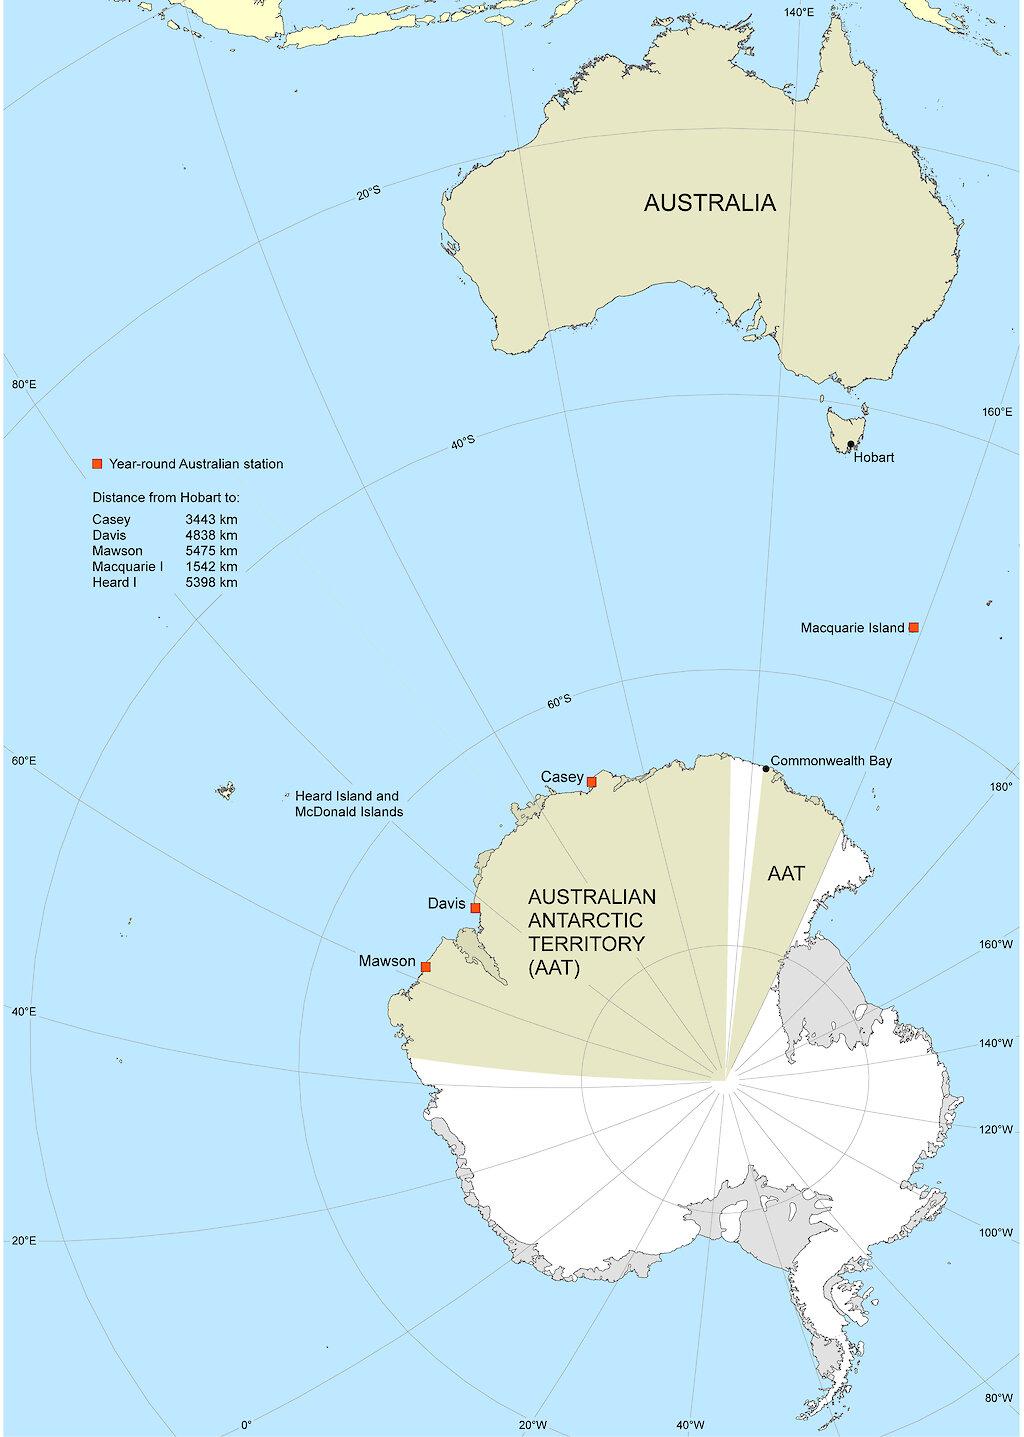 antarctic-stations-map.1024x0.jpg